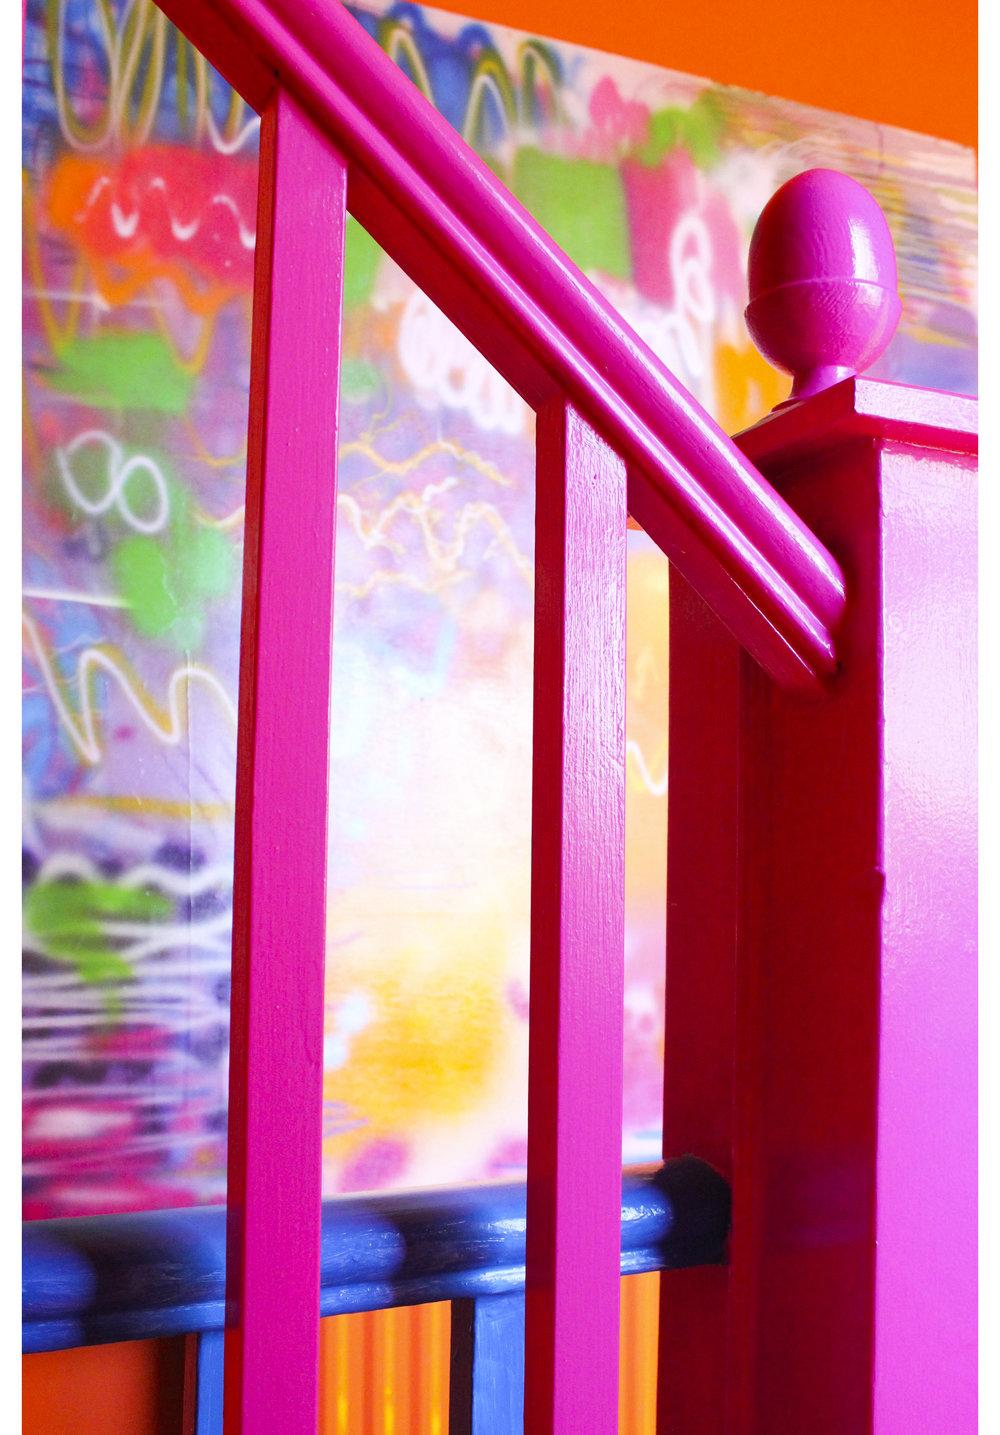 MLH Pink Bannisters Graffiti Pic.jpg